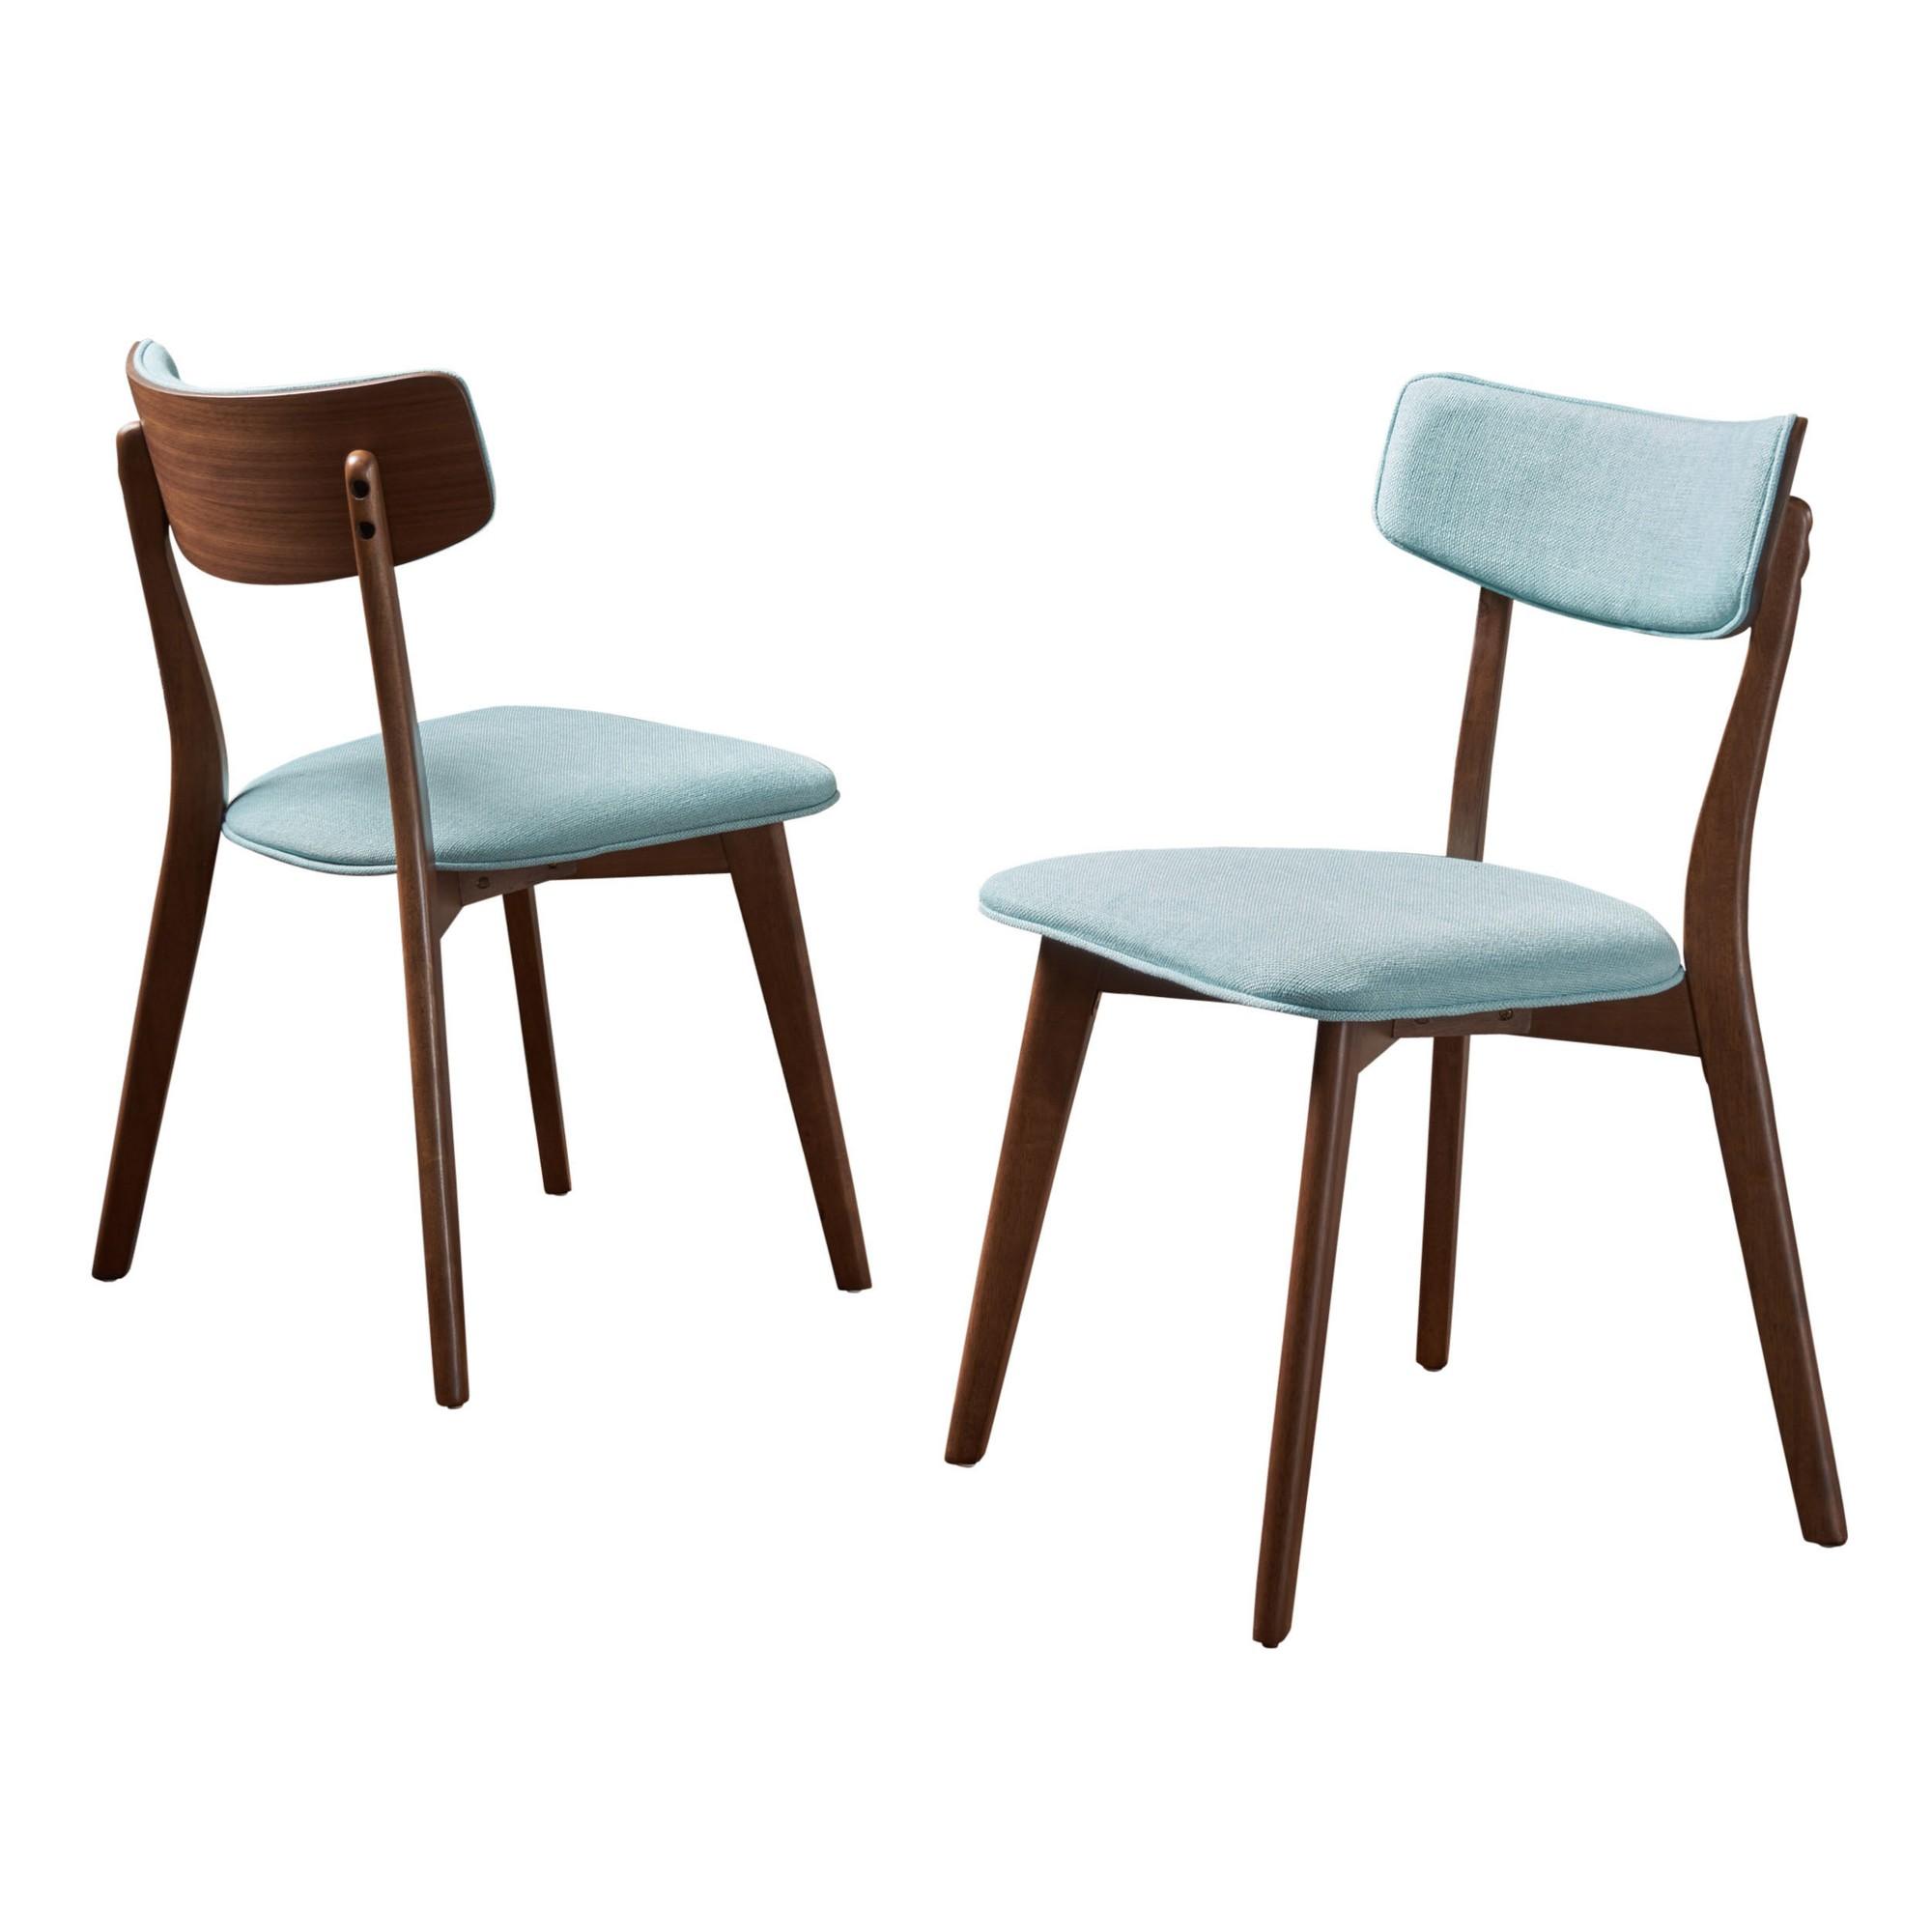 chazz mid century dining chair gray set of 2 christopher rh pinterest com